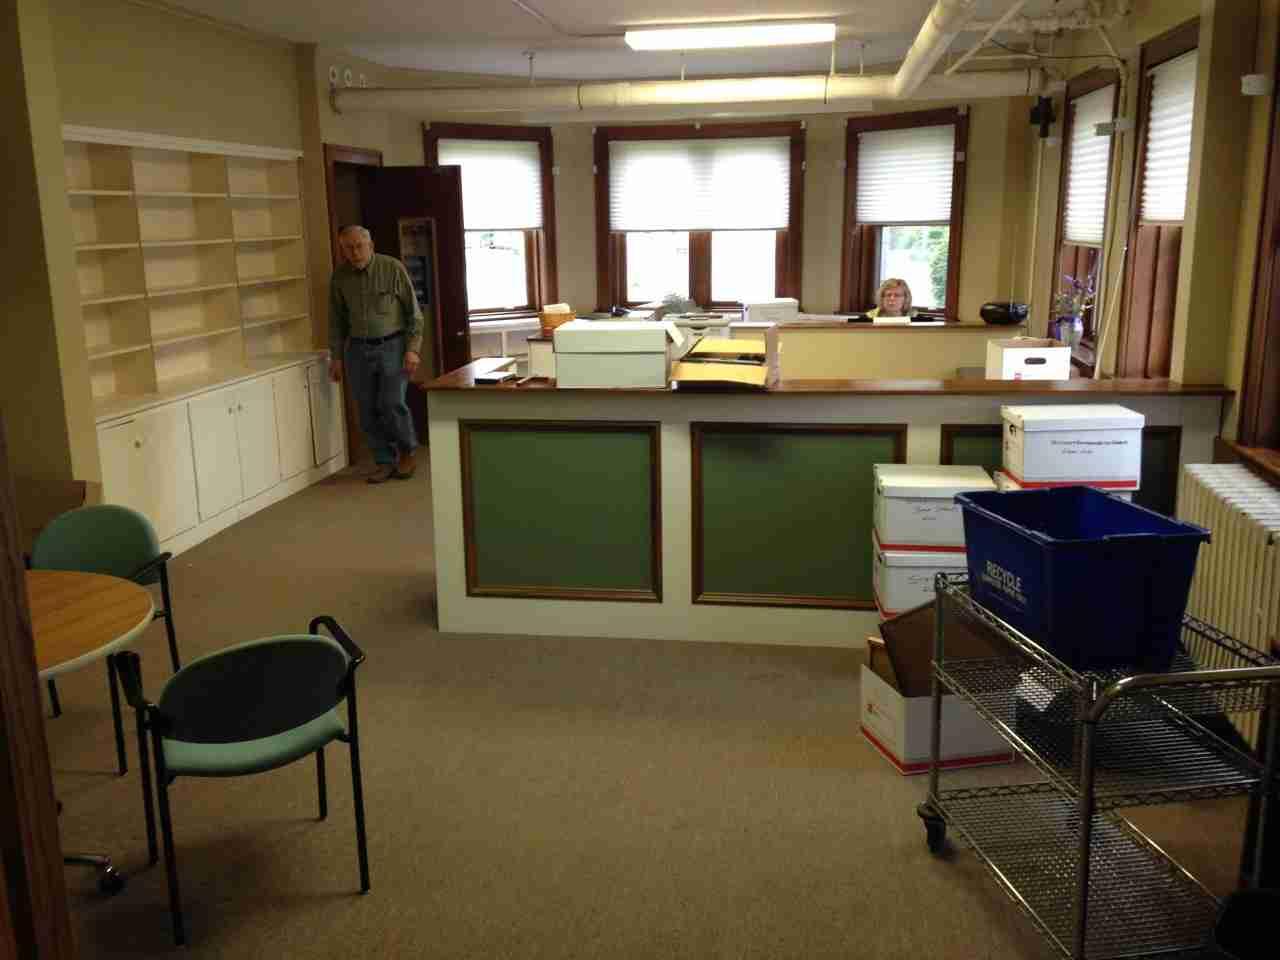 Main office getting emptier